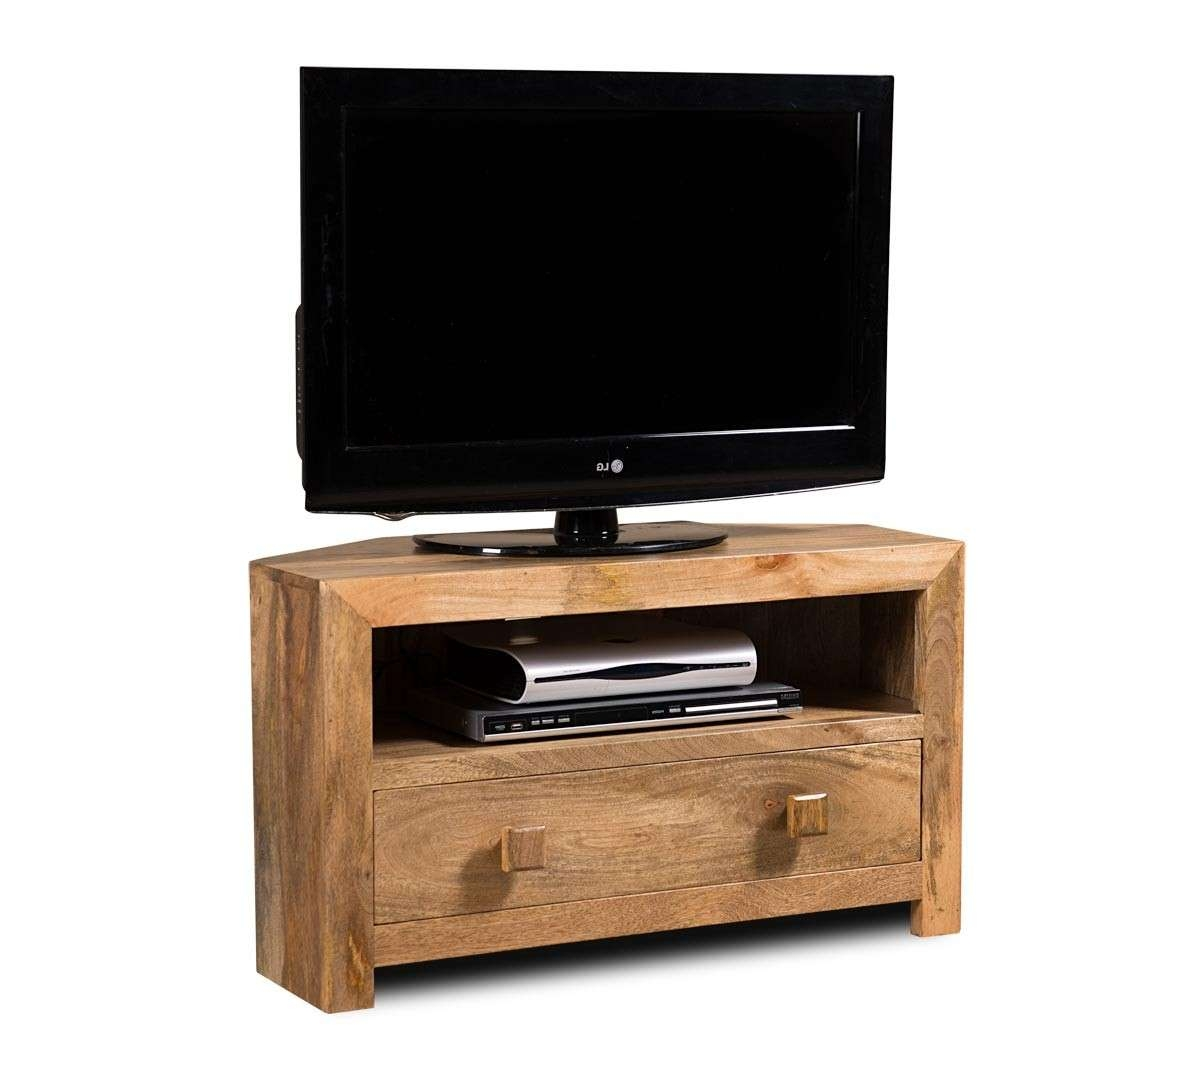 Dakota Light Mango Small Corner Tv Stand | Casa Bella Furniture Uk In Wood Corner Tv Cabinets (View 4 of 20)